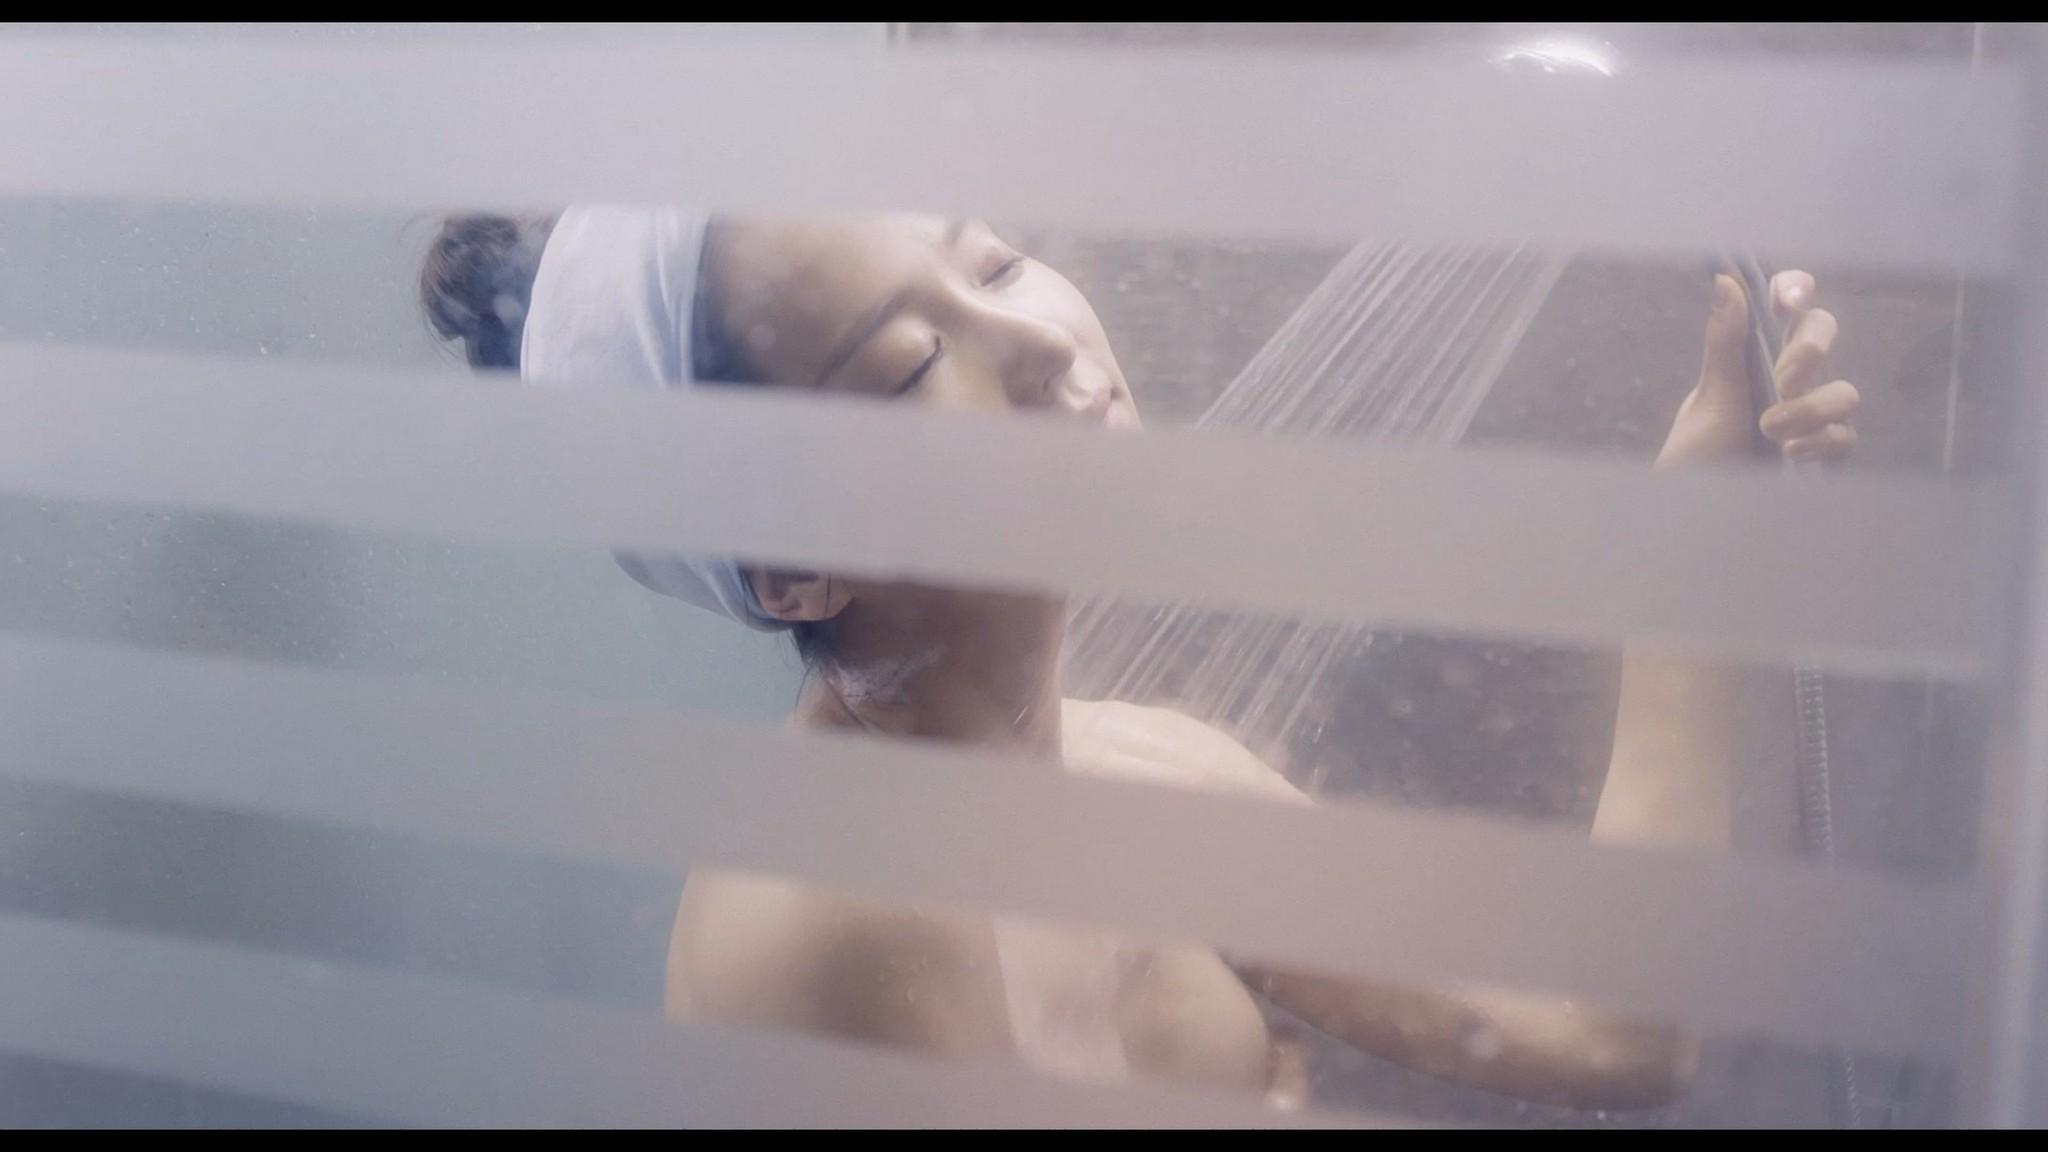 Yeo jeong Cho nude Clara Lee sexy Casa Amor Exclusive for Ladies 2015 1080p BluRay 2